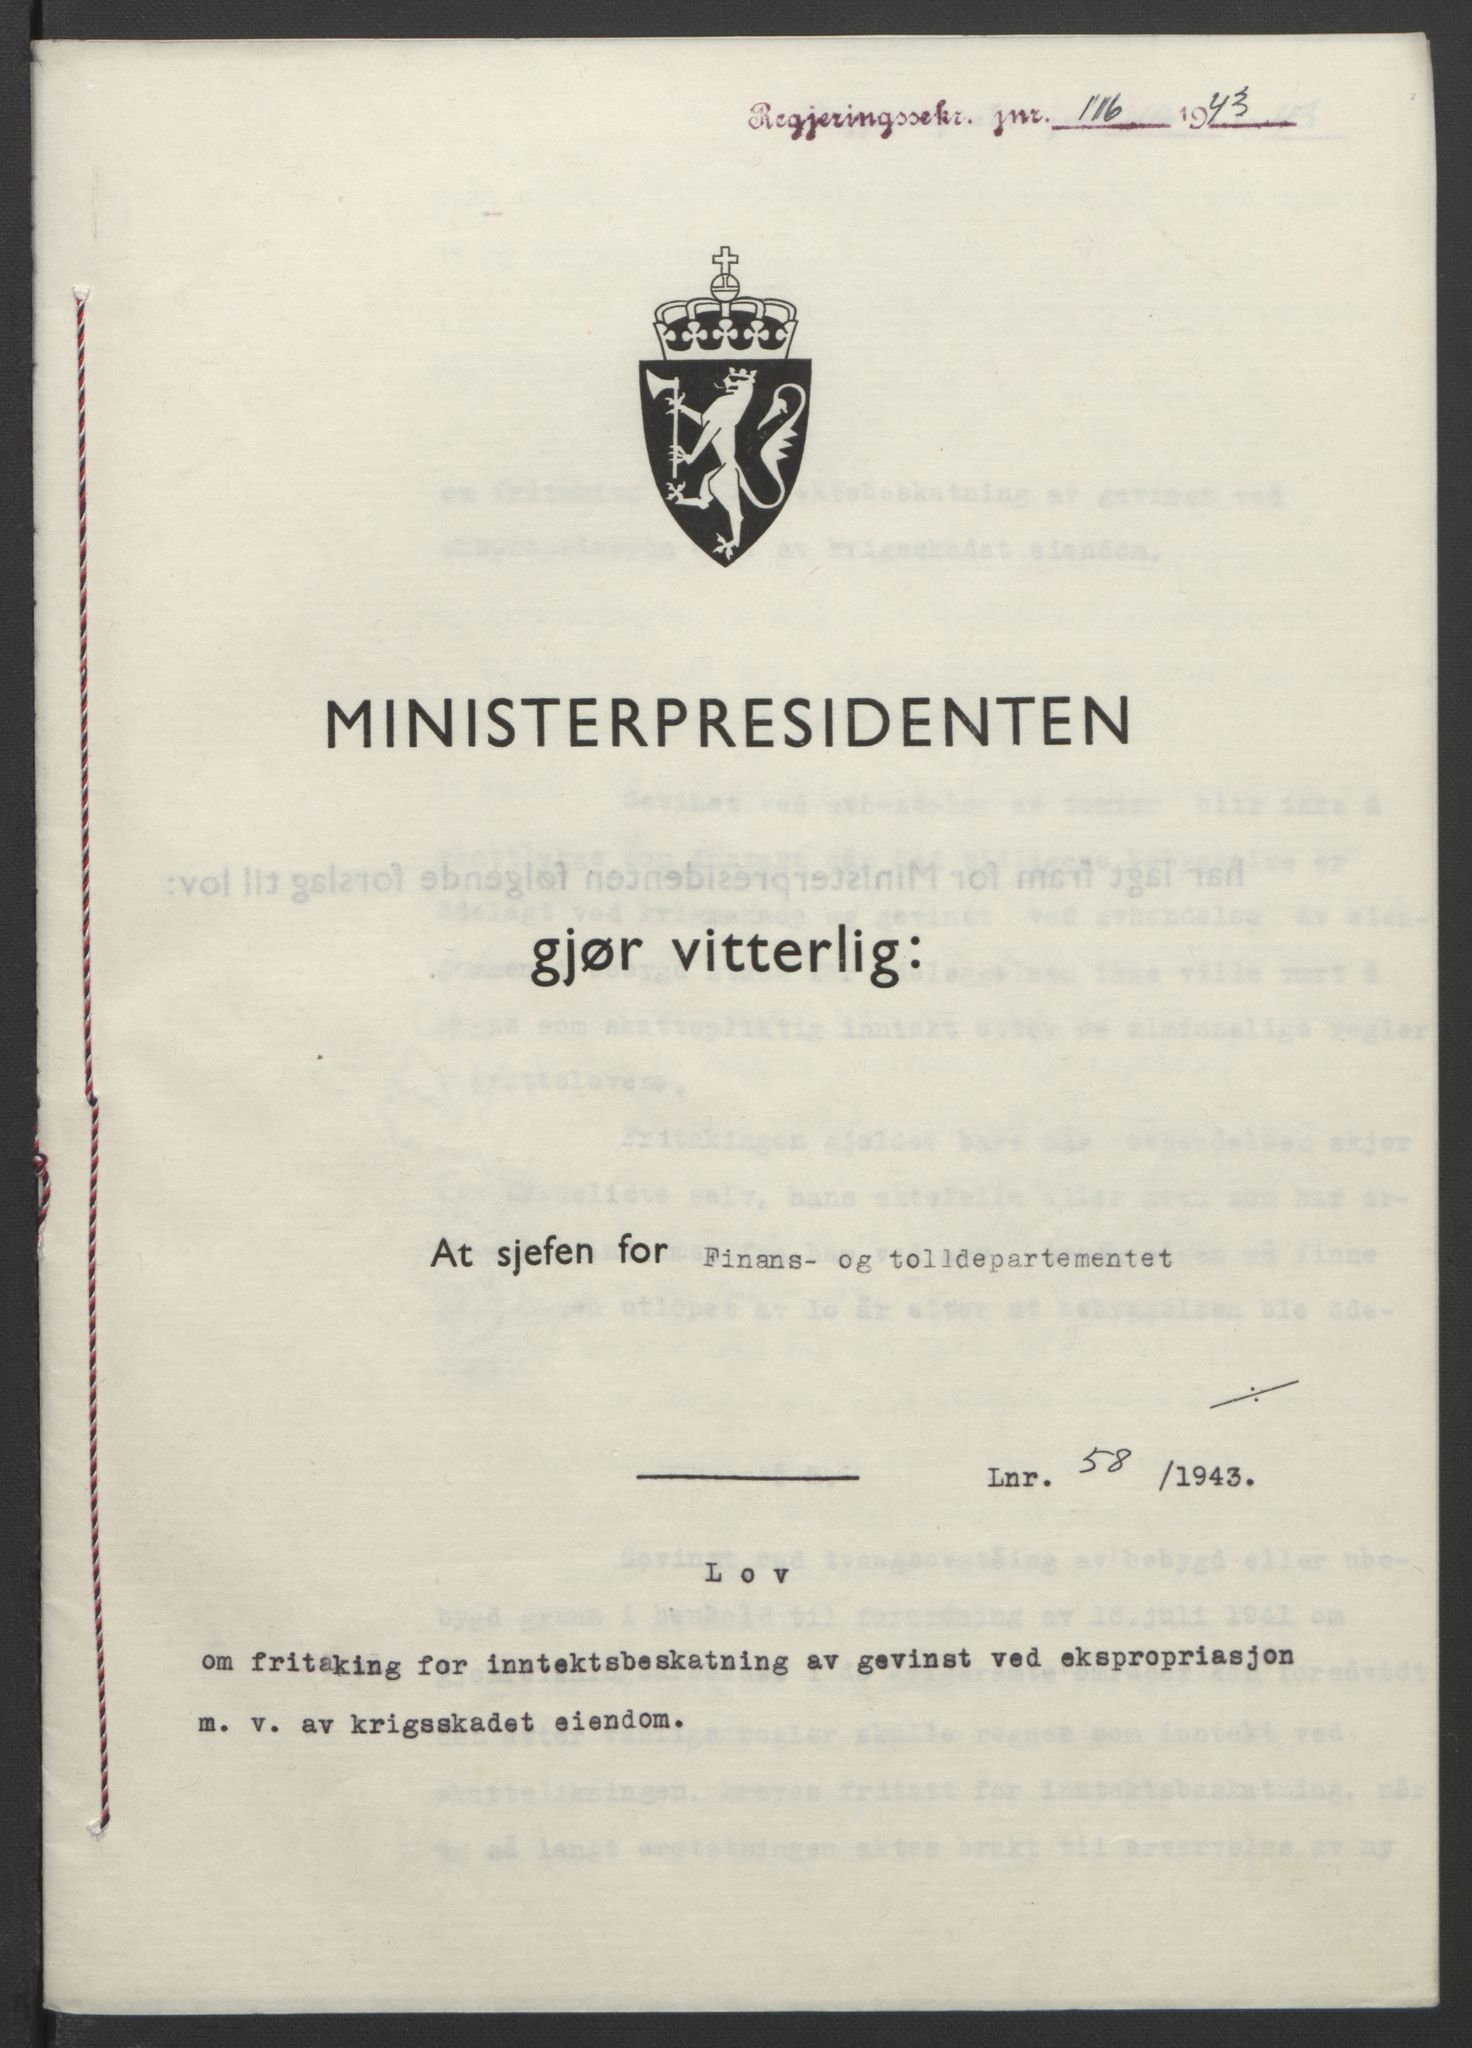 RA, NS-administrasjonen 1940-1945 (Statsrådsekretariatet, de kommisariske statsråder mm), D/Db/L0099: Lover, 1943, s. 259